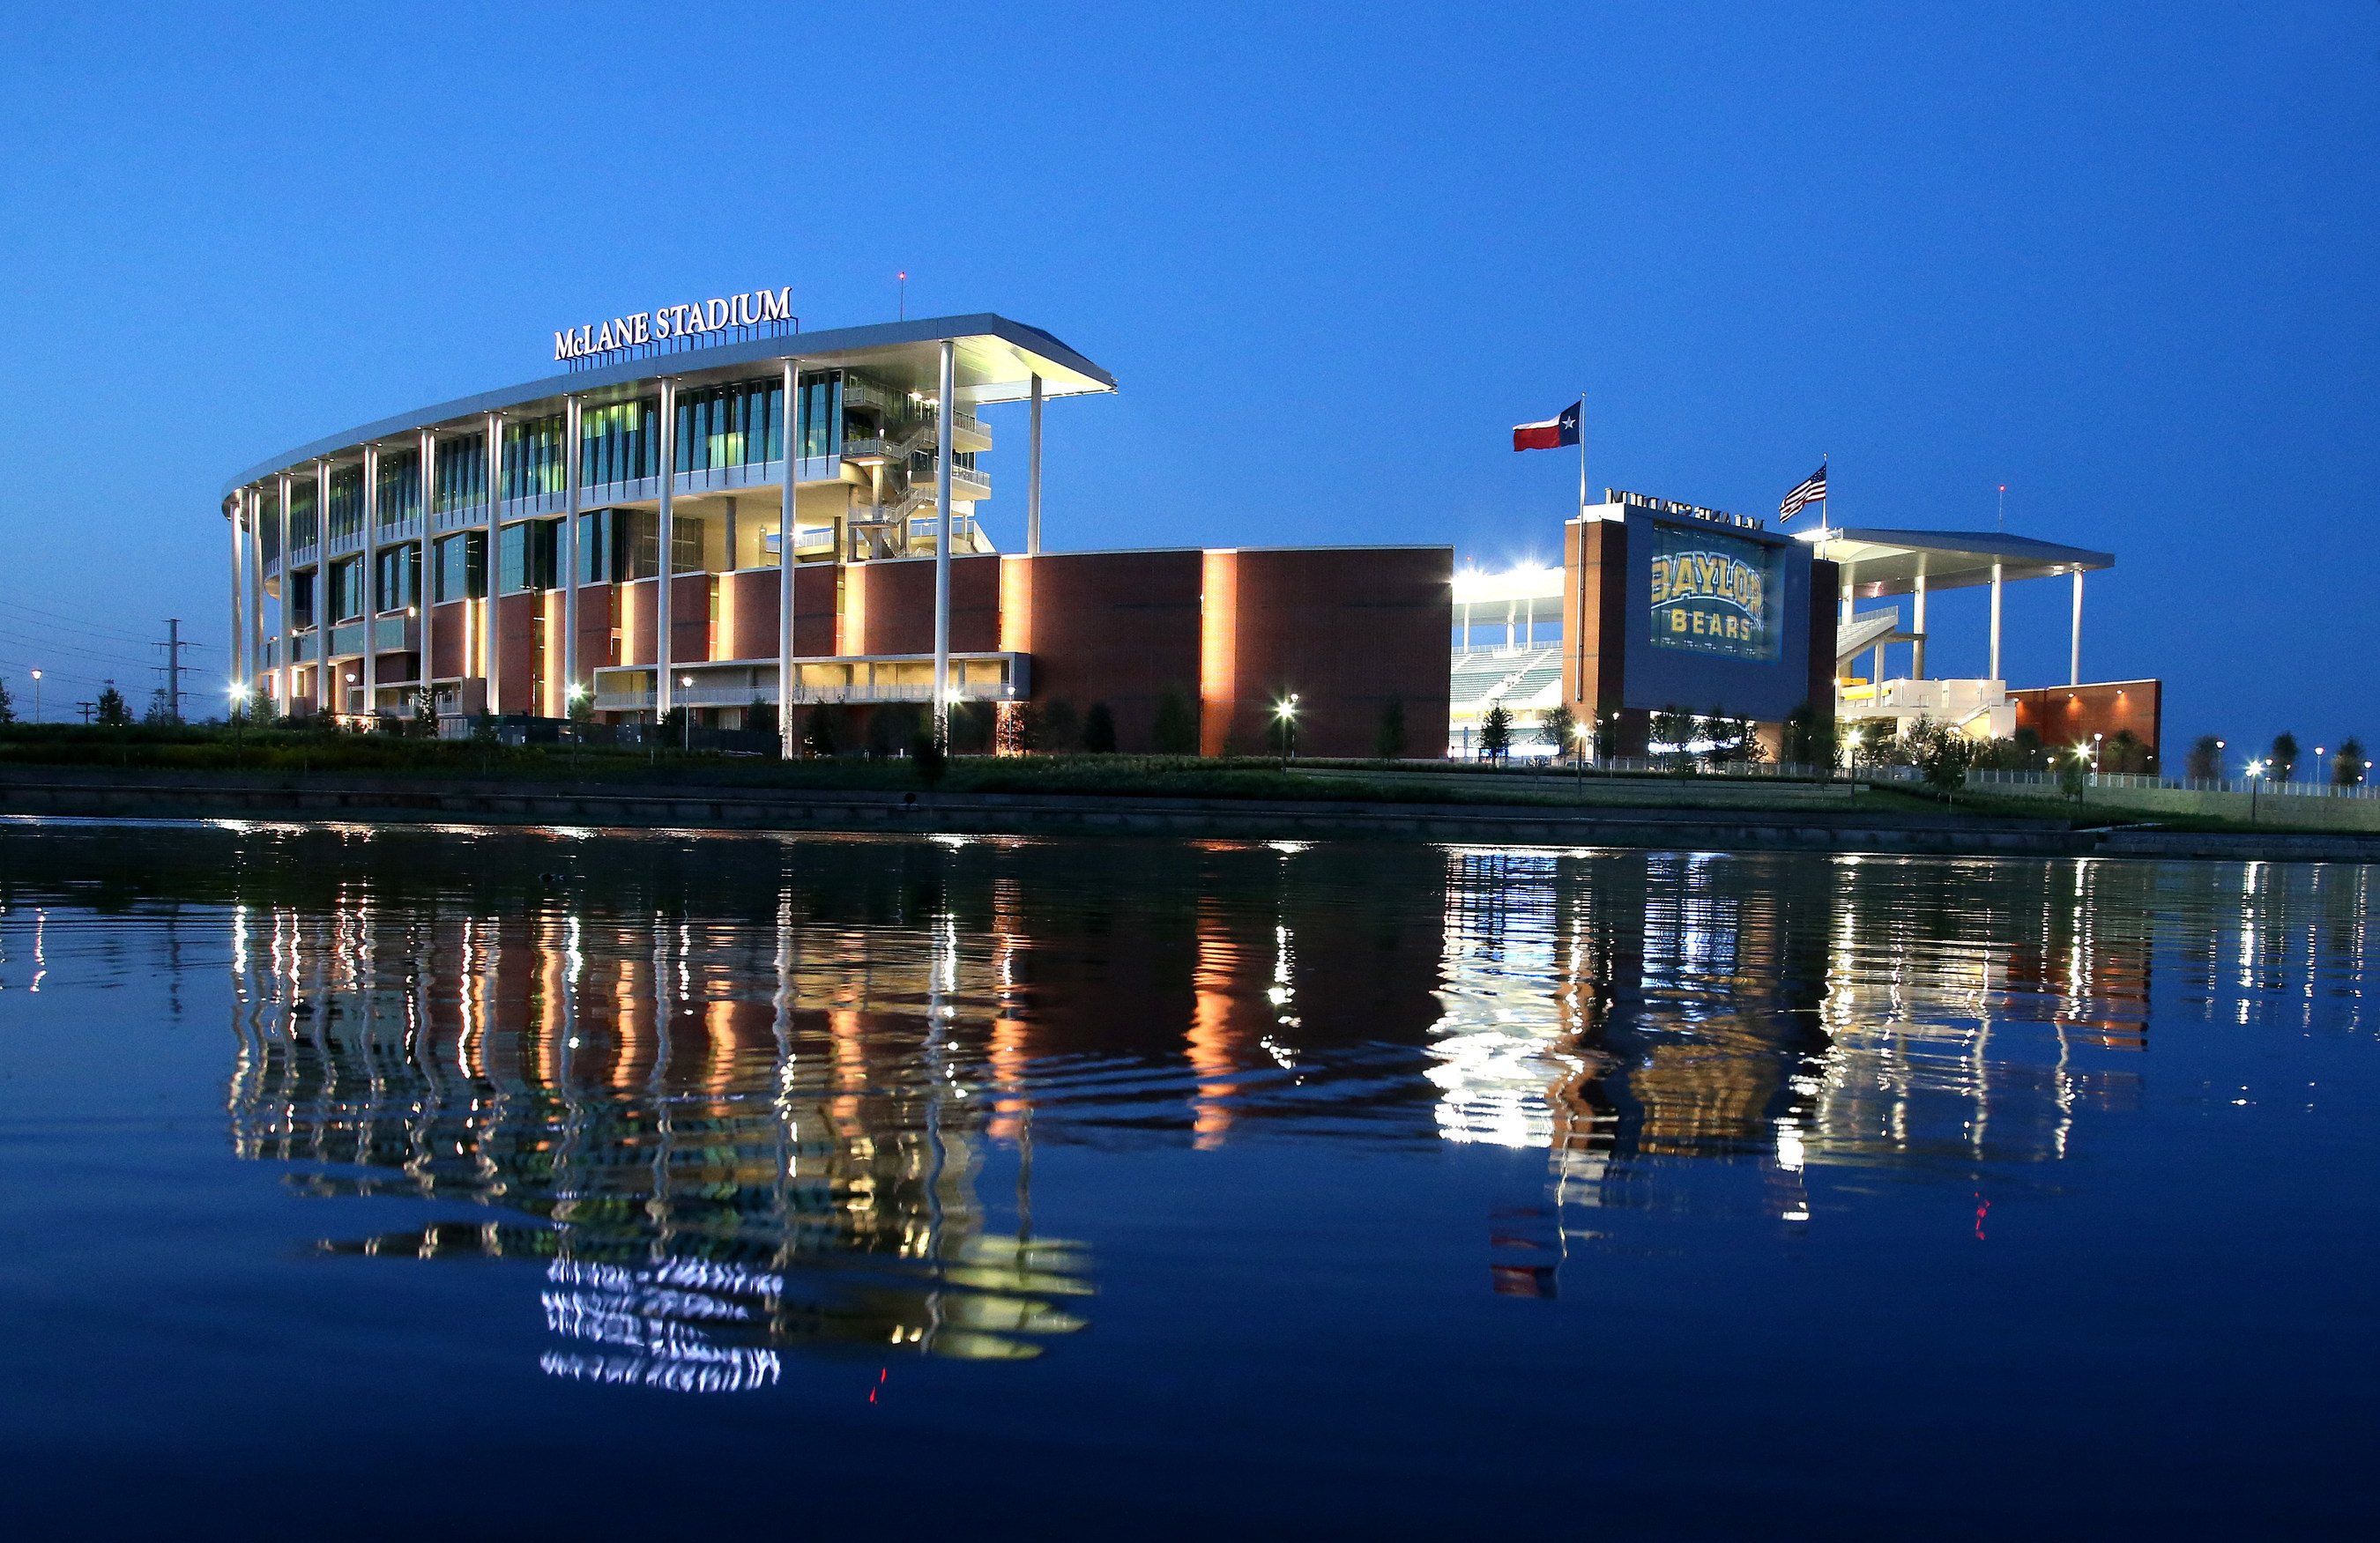 McLane Stadium in Waco, Texas. Courtesy of Matthew Minard, Baylor University Marketing & Communications. (PRNewsFoto/Extreme Networks, Inc.)